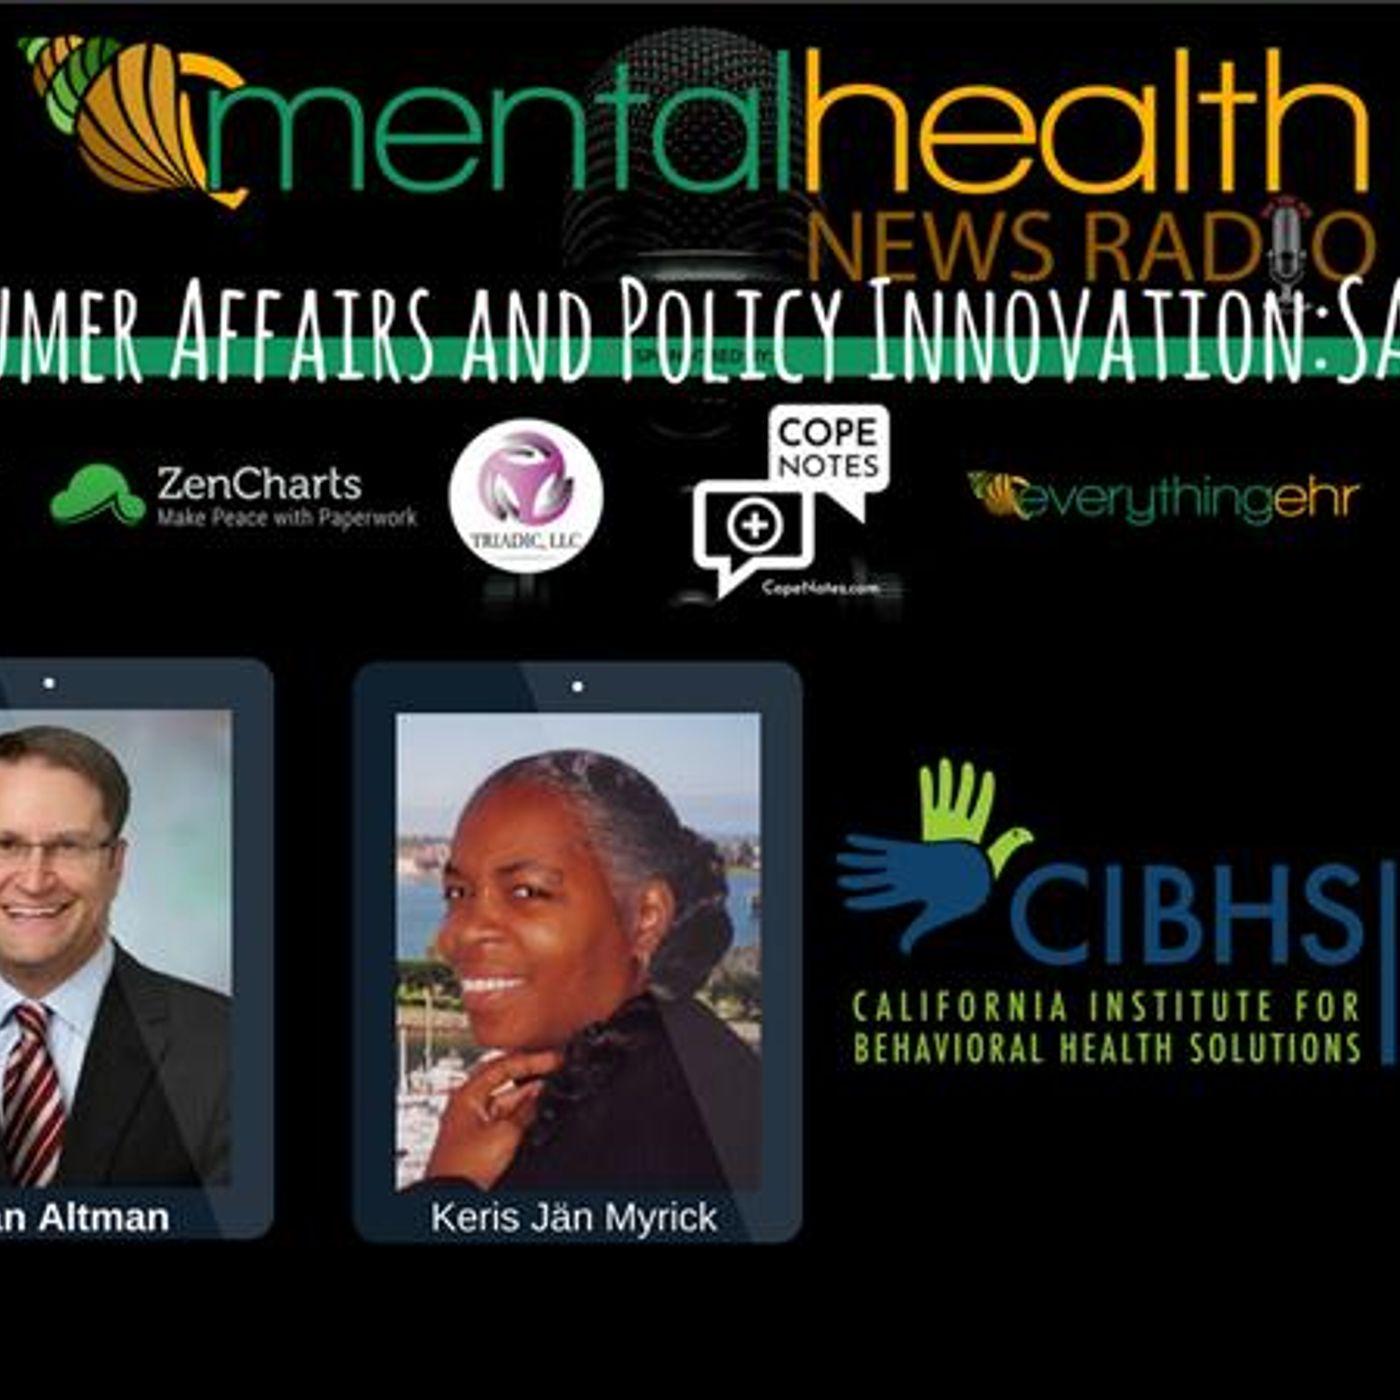 Mental Health News Radio - Consumer Affairs and Policy Innovation in Behavioral Health: SAMHSA